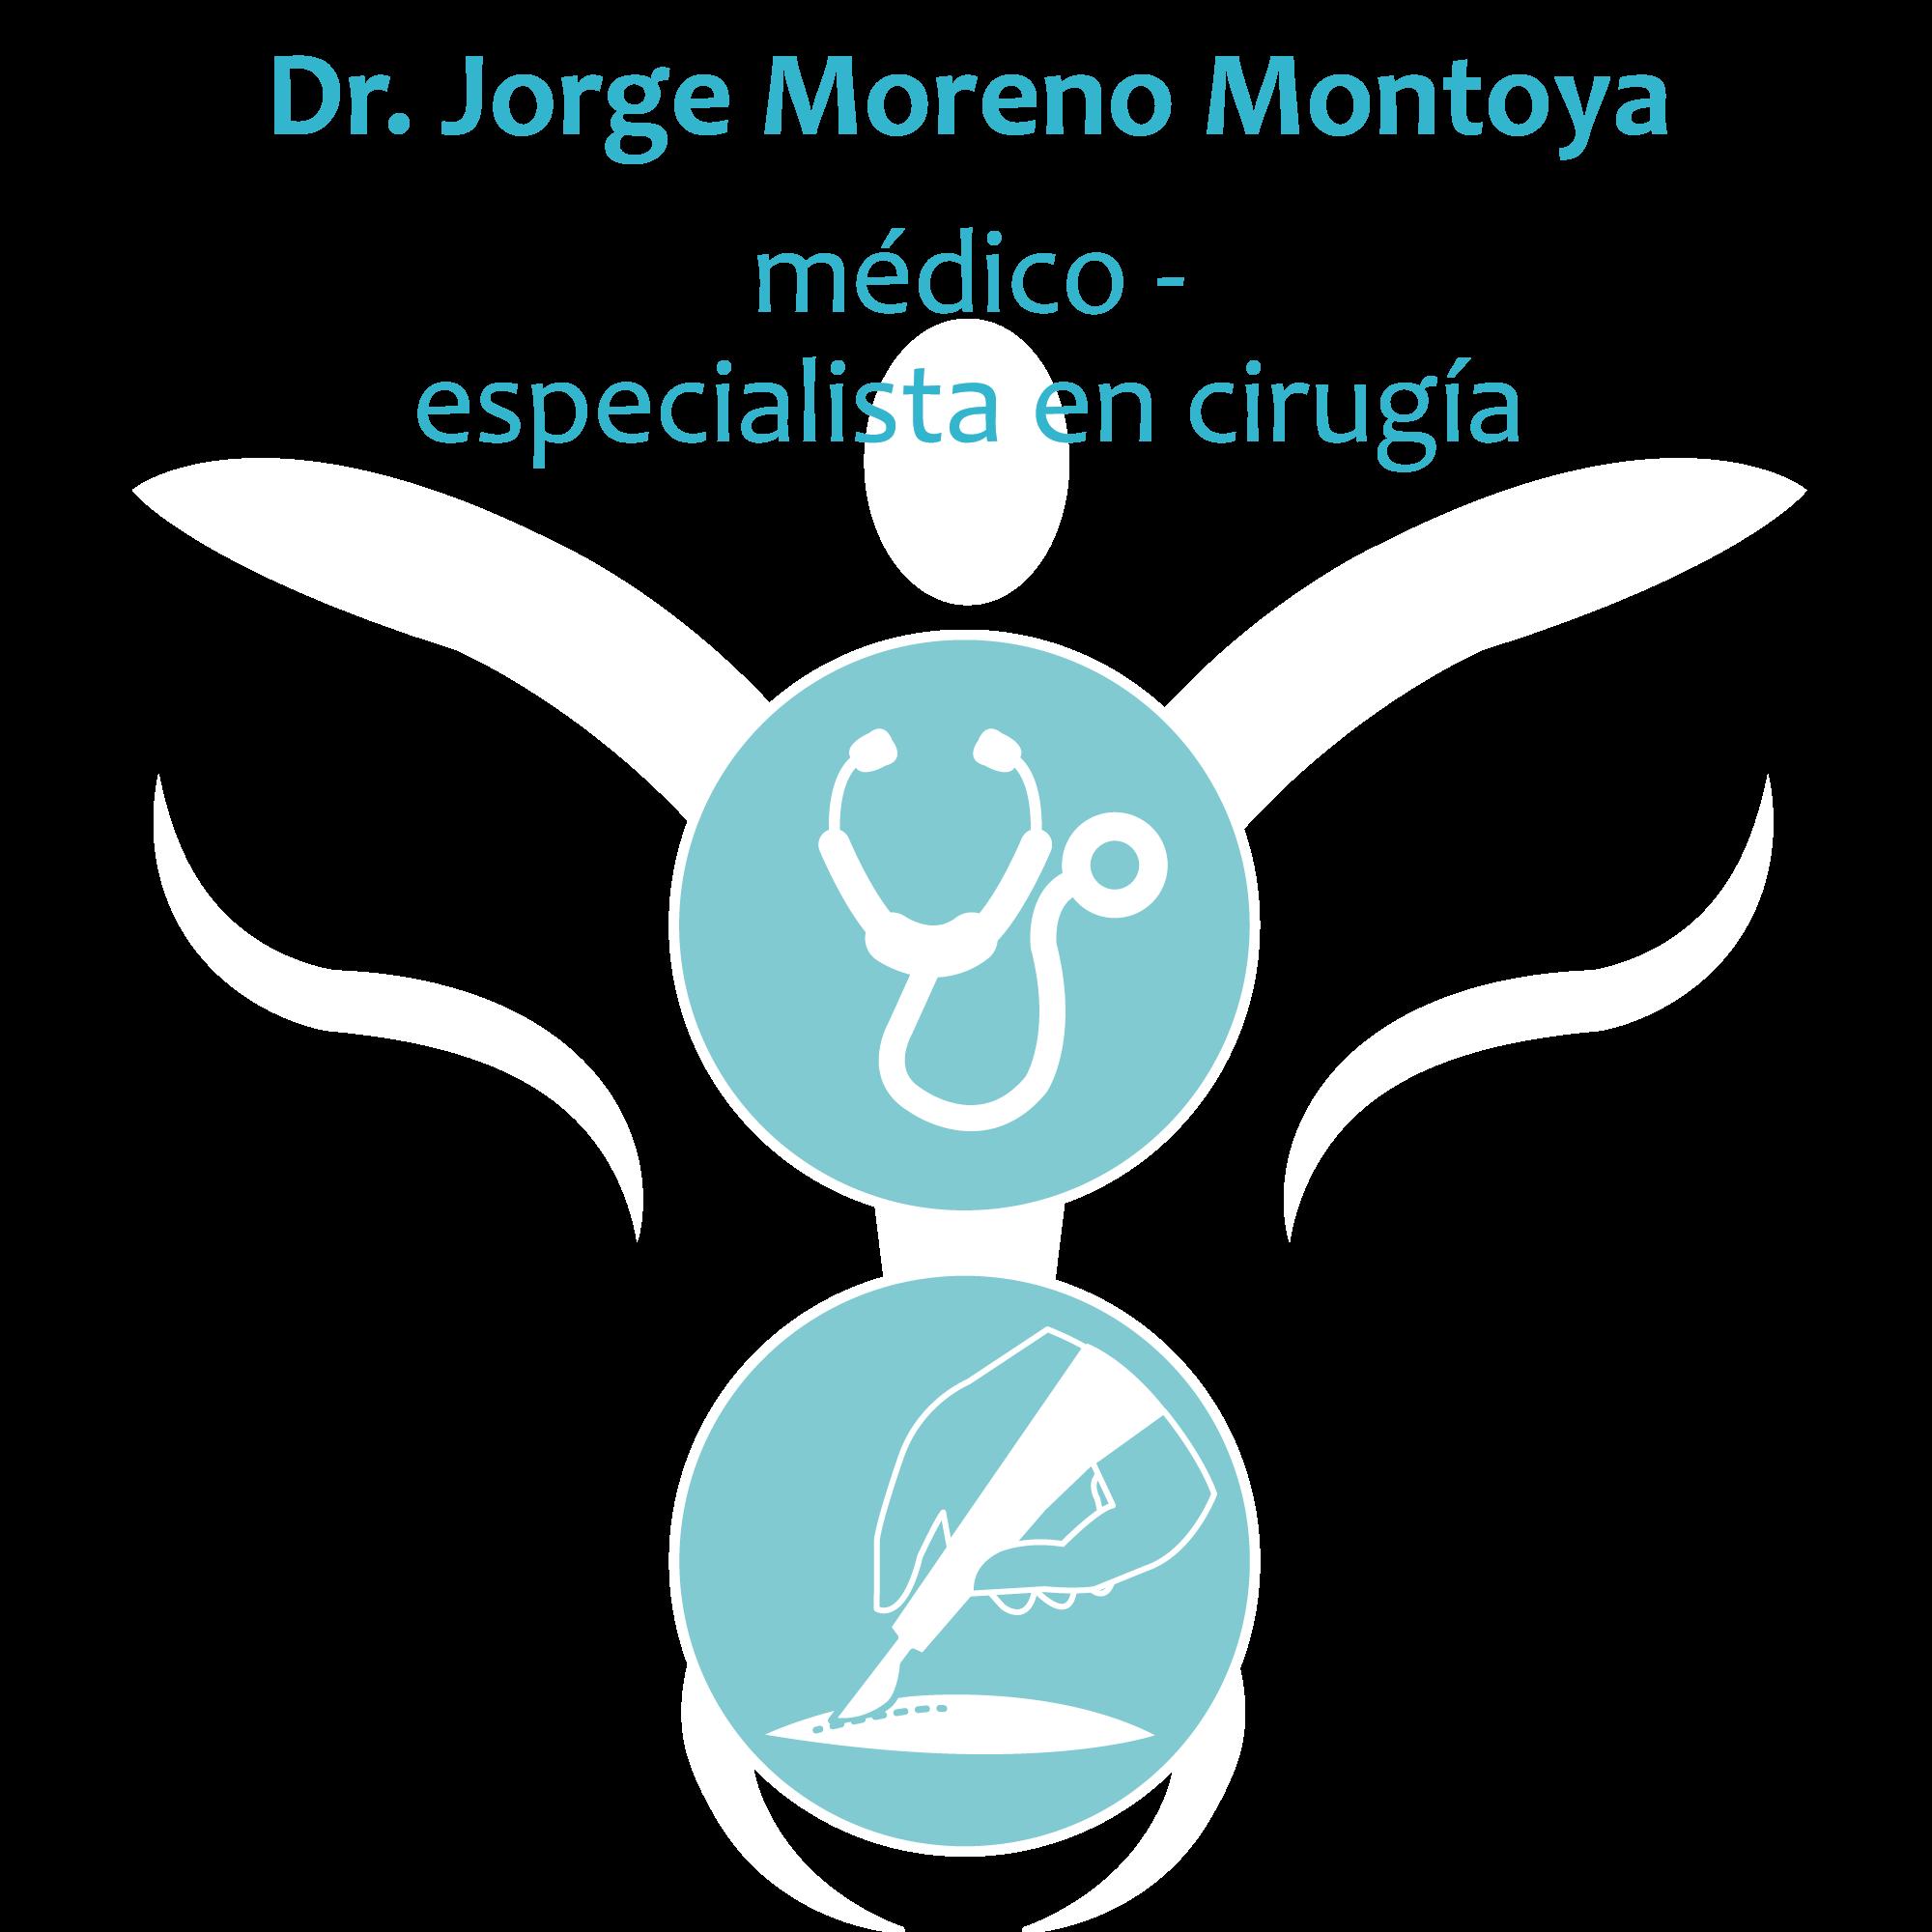 Dr. Jorge Moreno Montoya